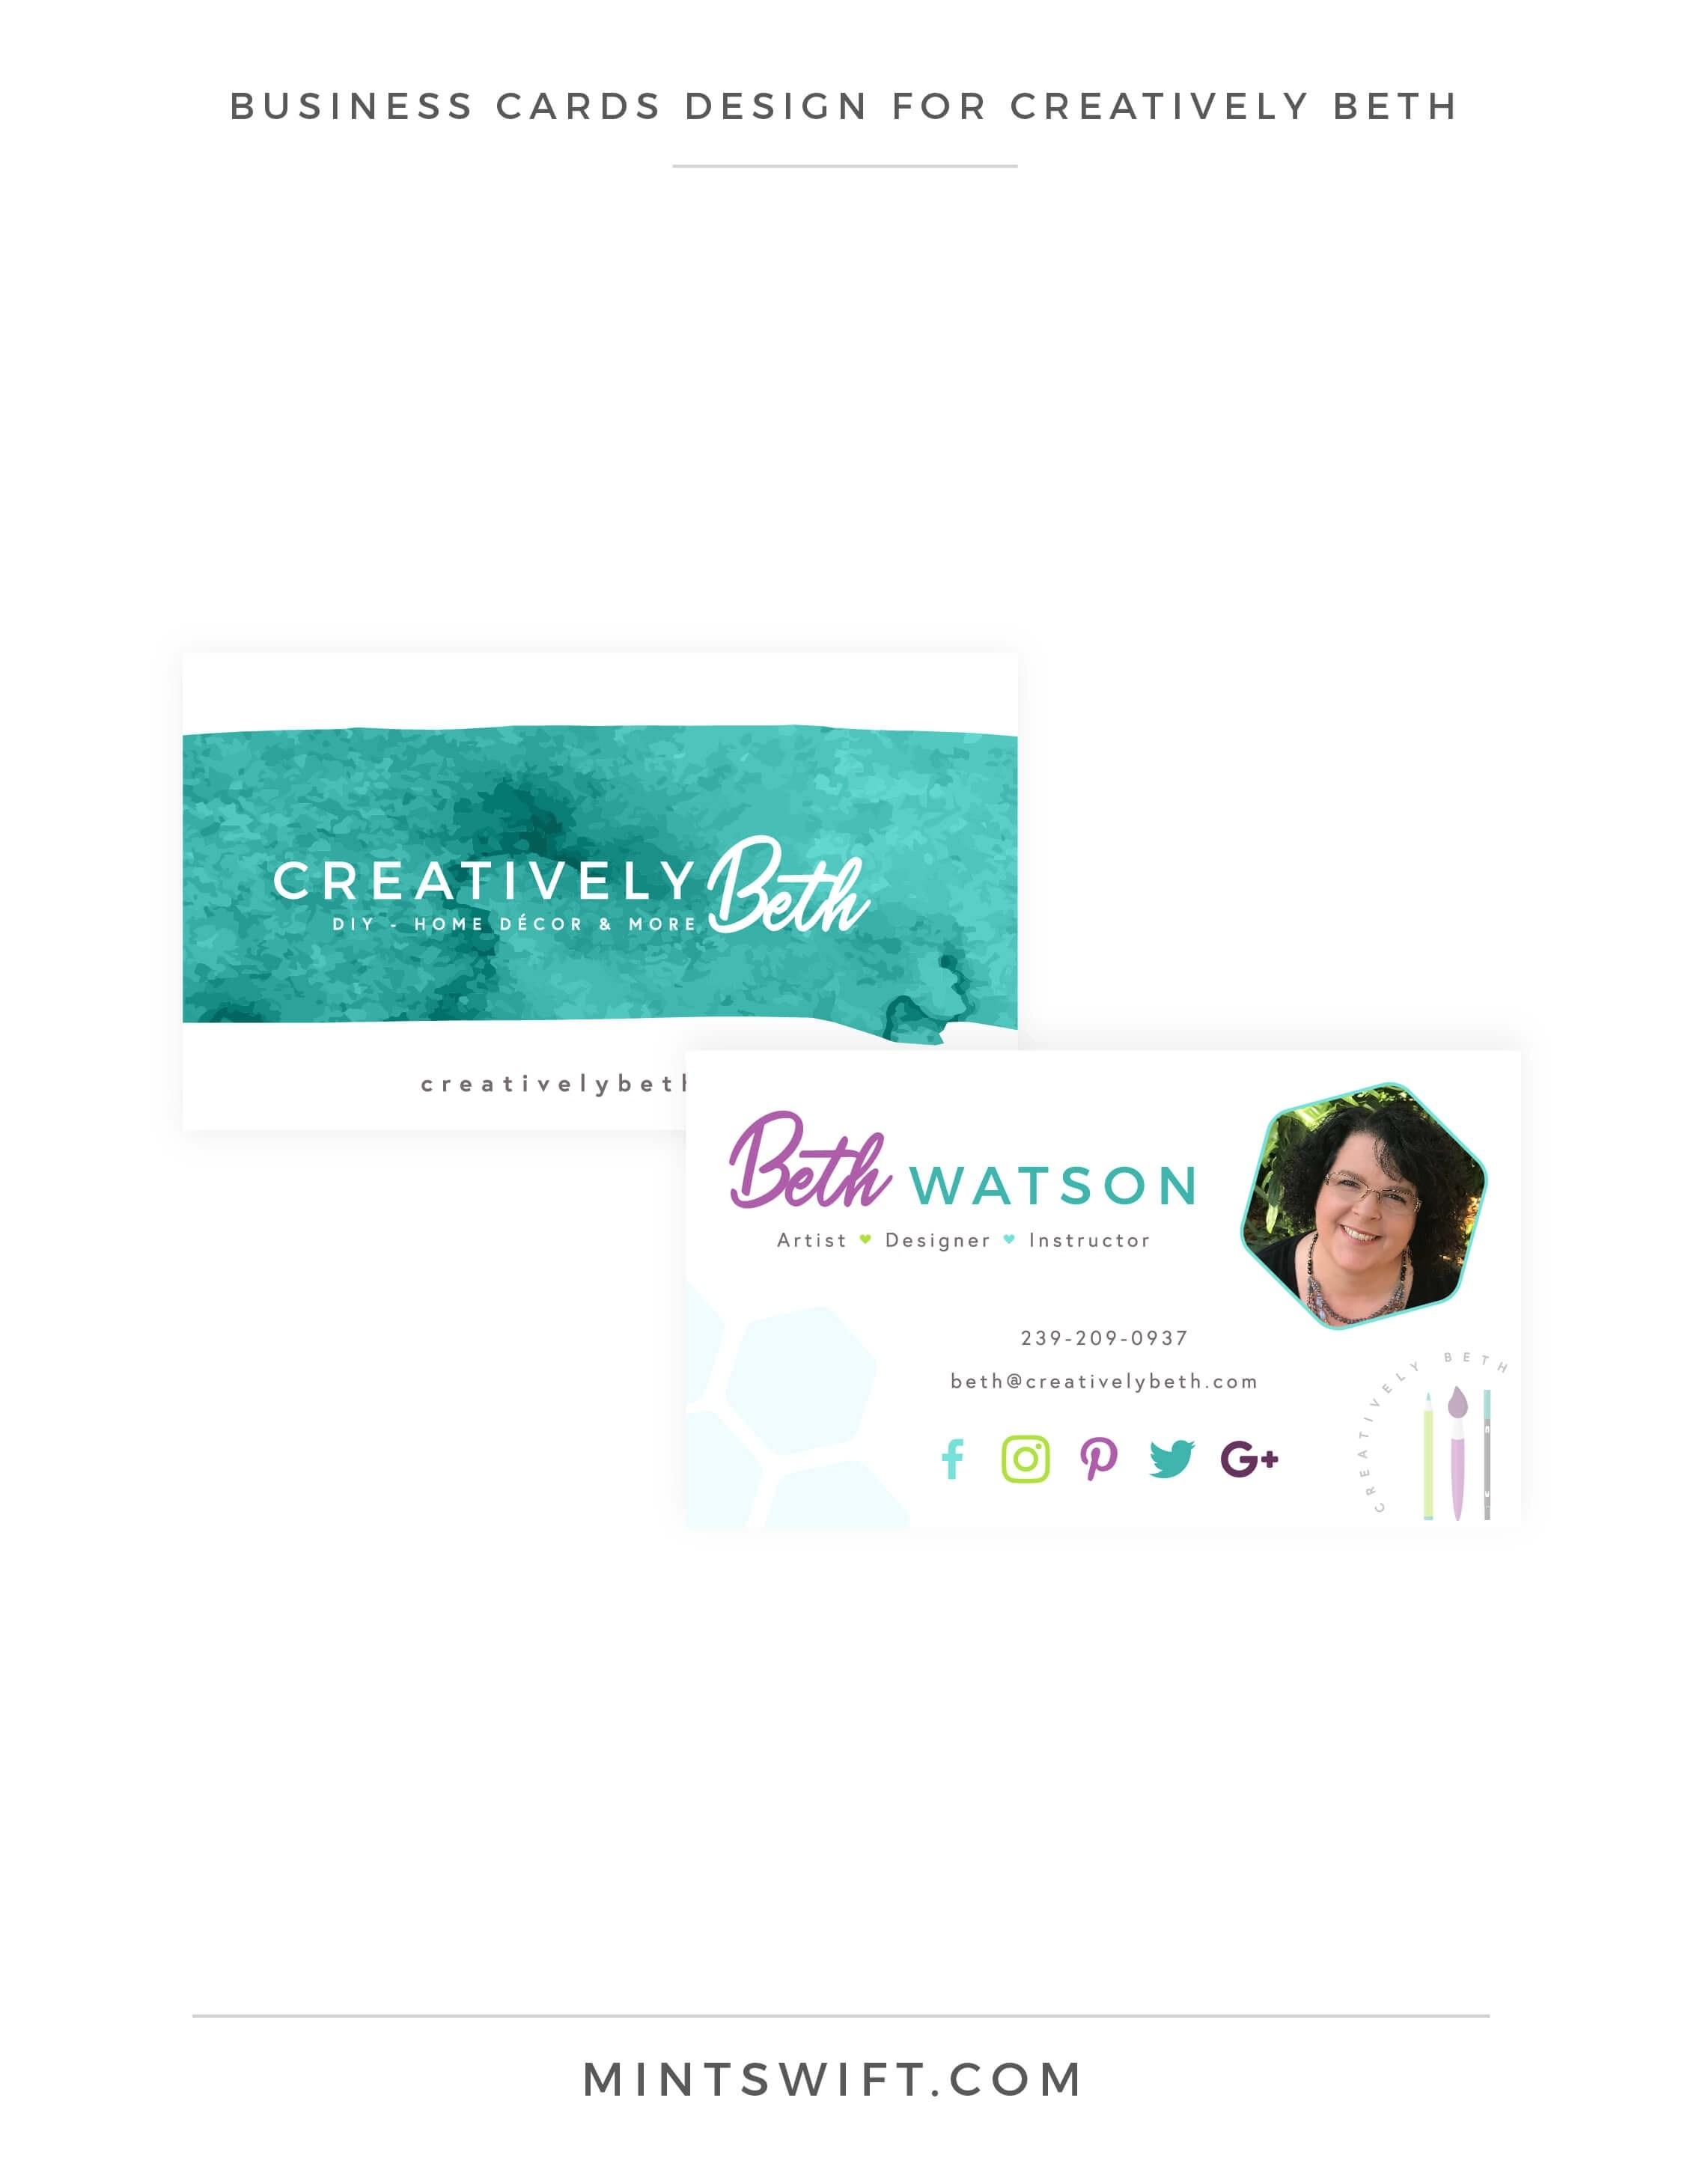 Creatively Beth - Business cards design - Brand & Website Design - MintSwift